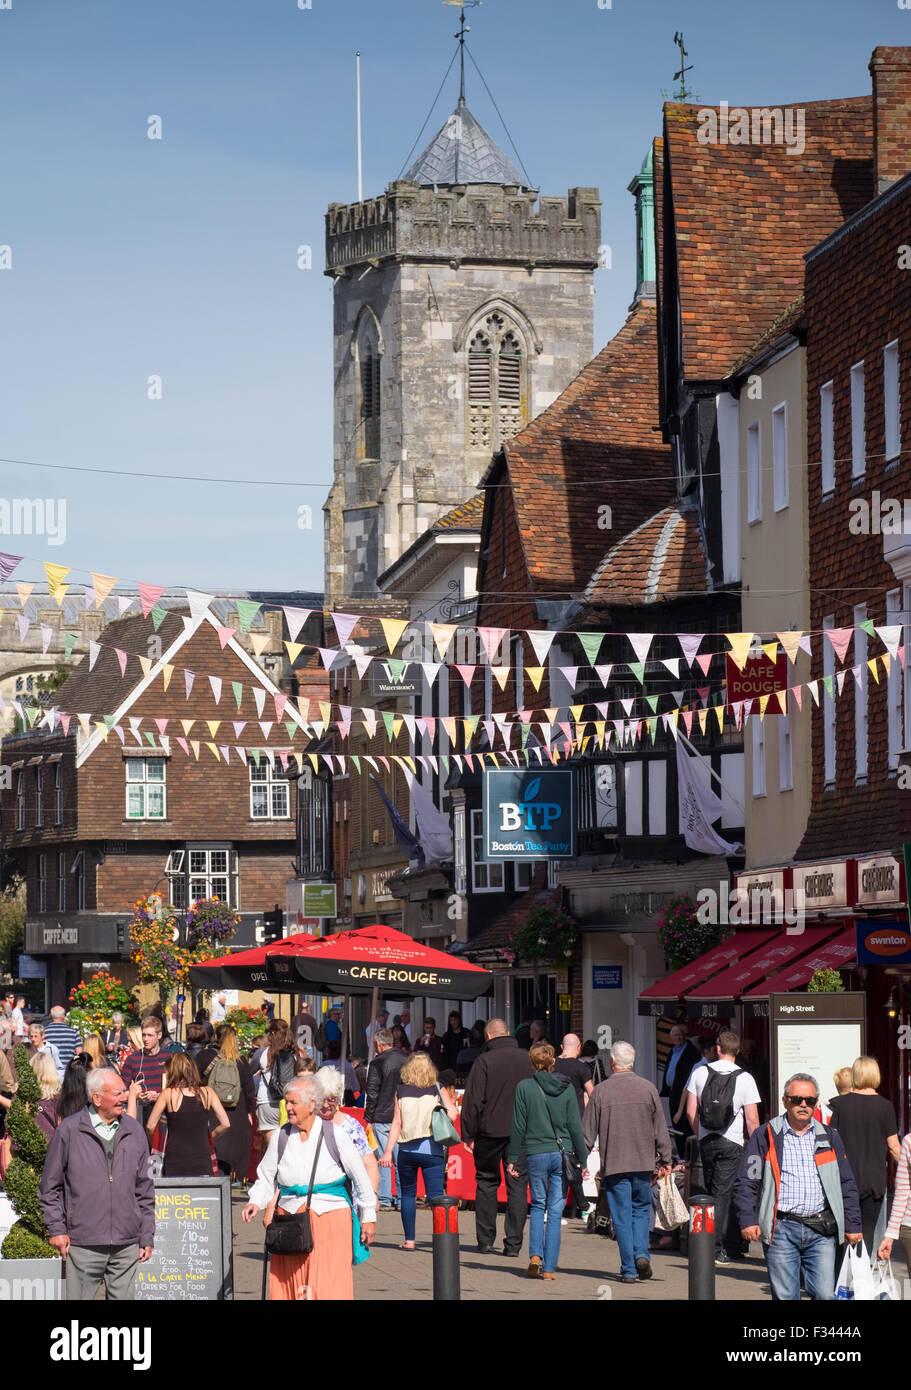 Los compradores en High Street, Salisbury Salisbury, Wiltshire, UK Imagen De Stock